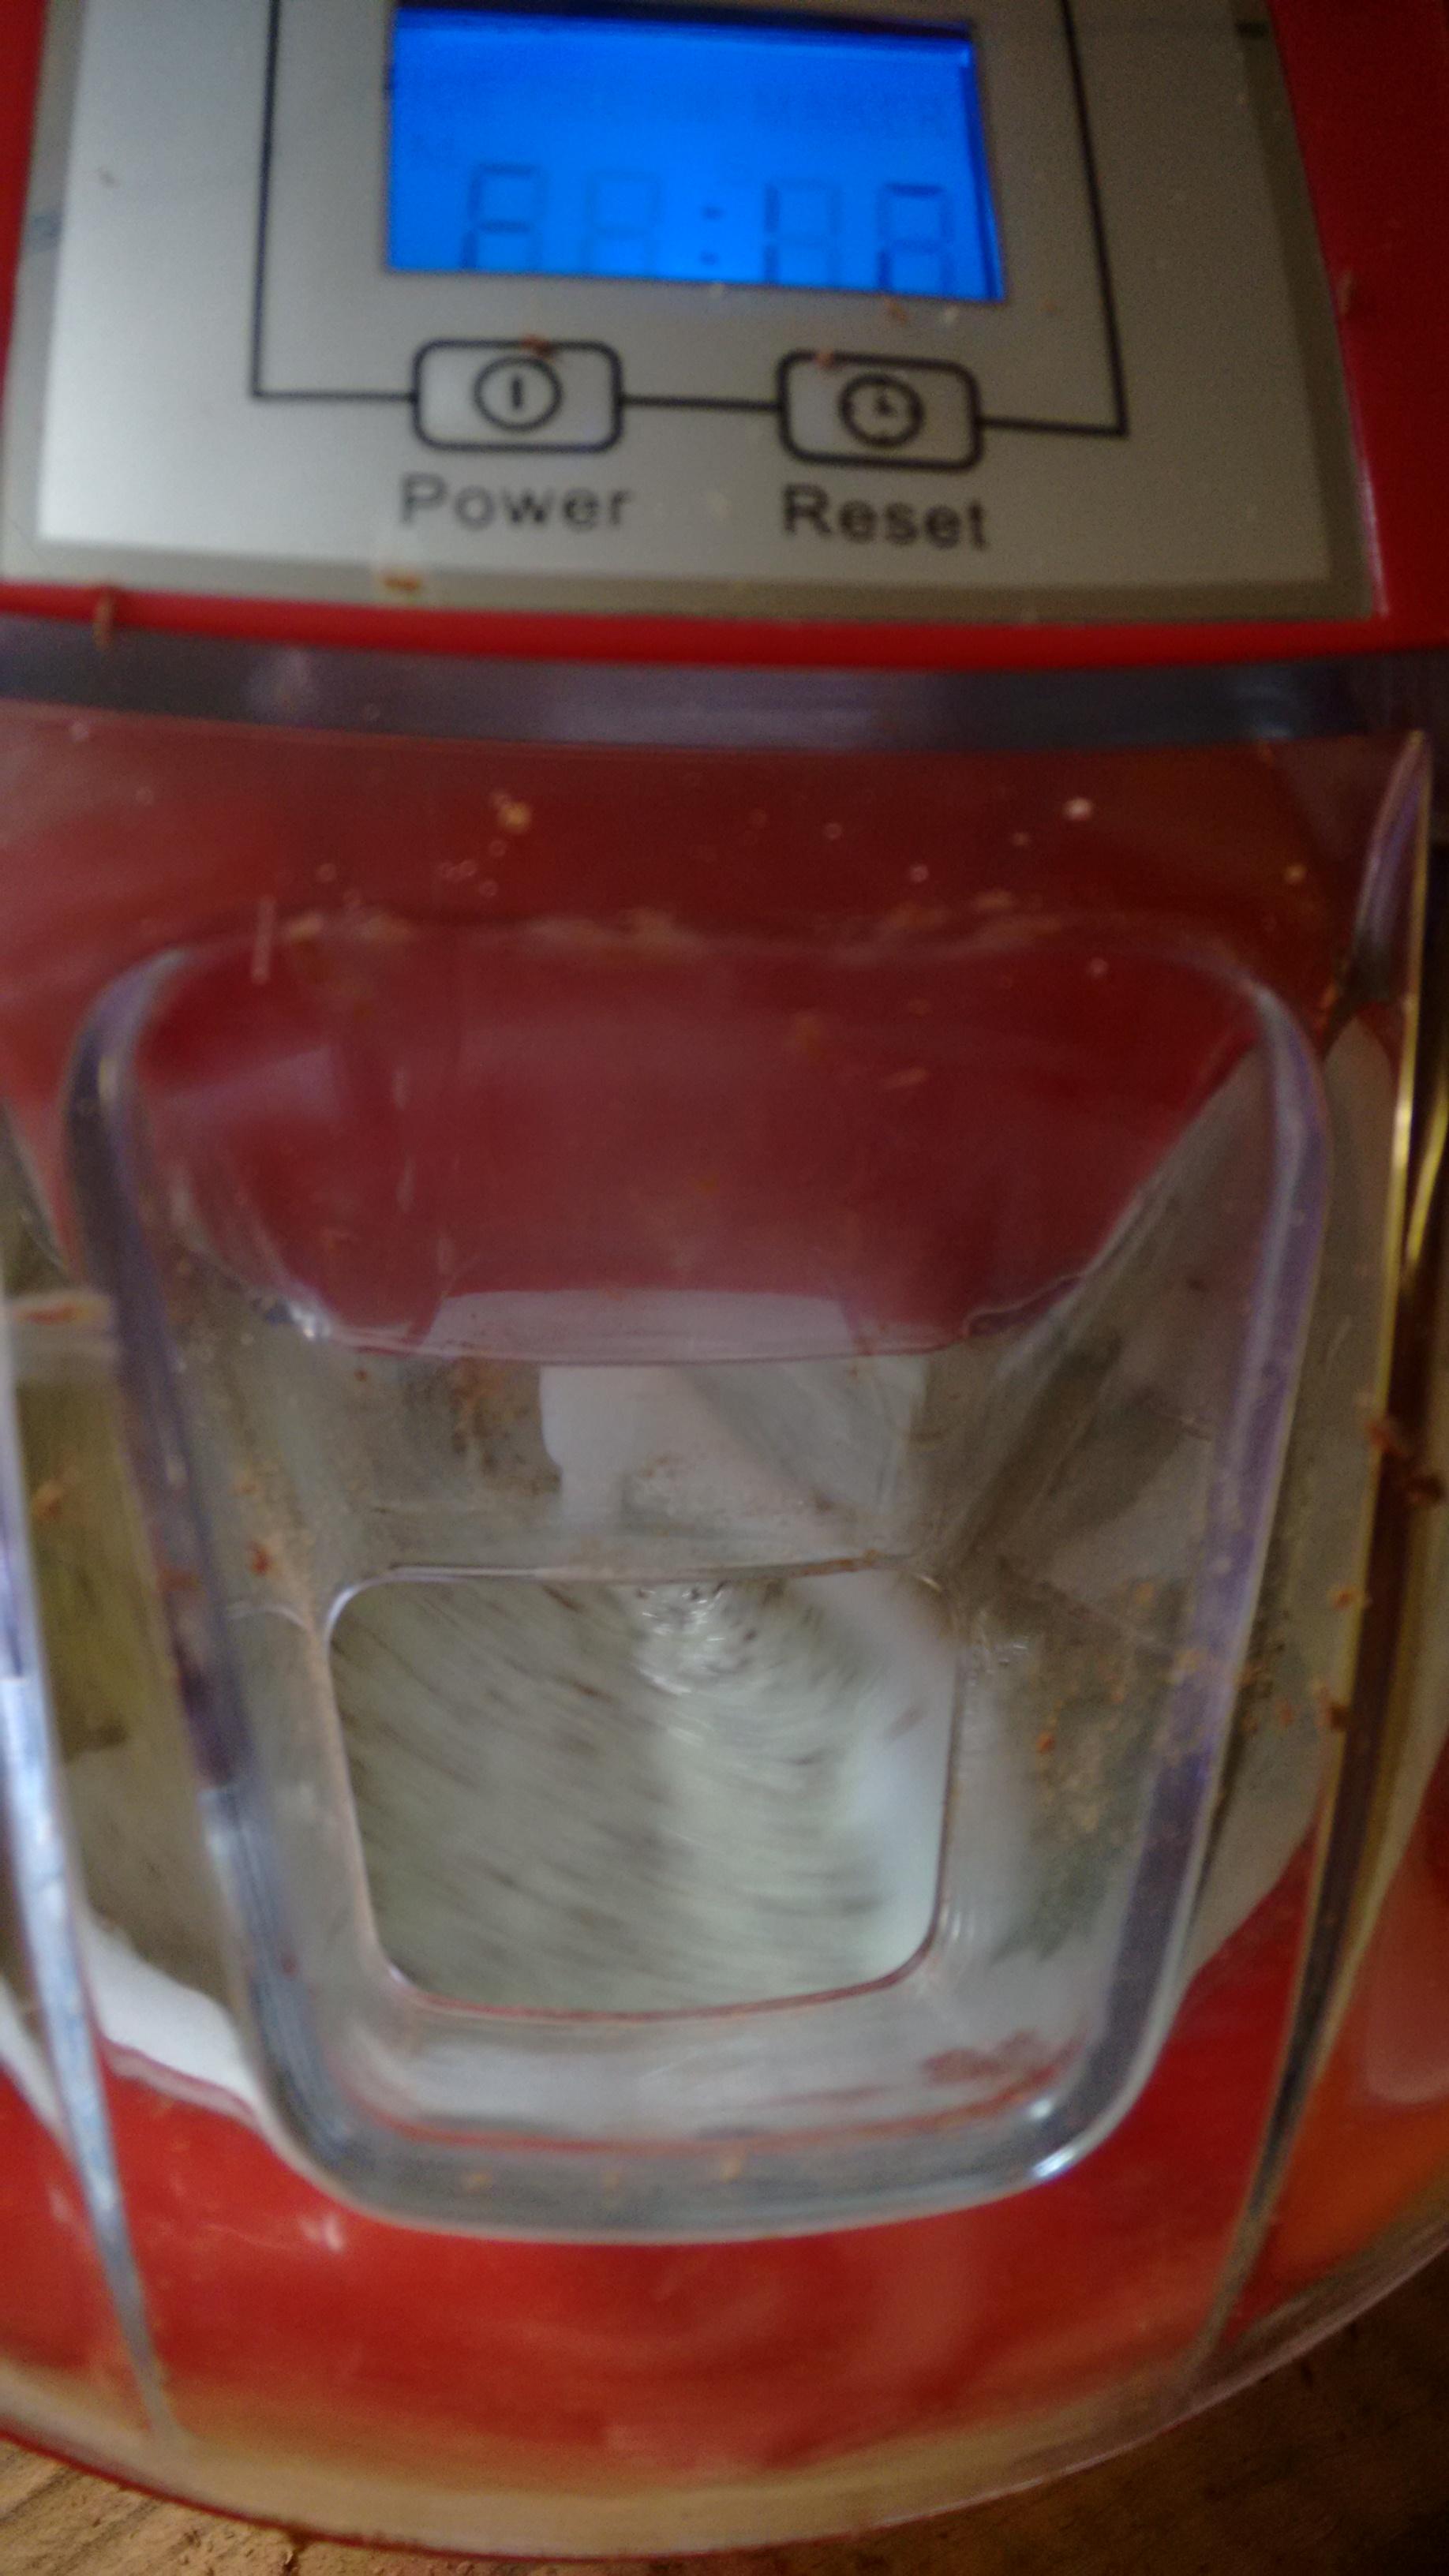 Ice cream thickening up in the Savisto Ice Cream Maker